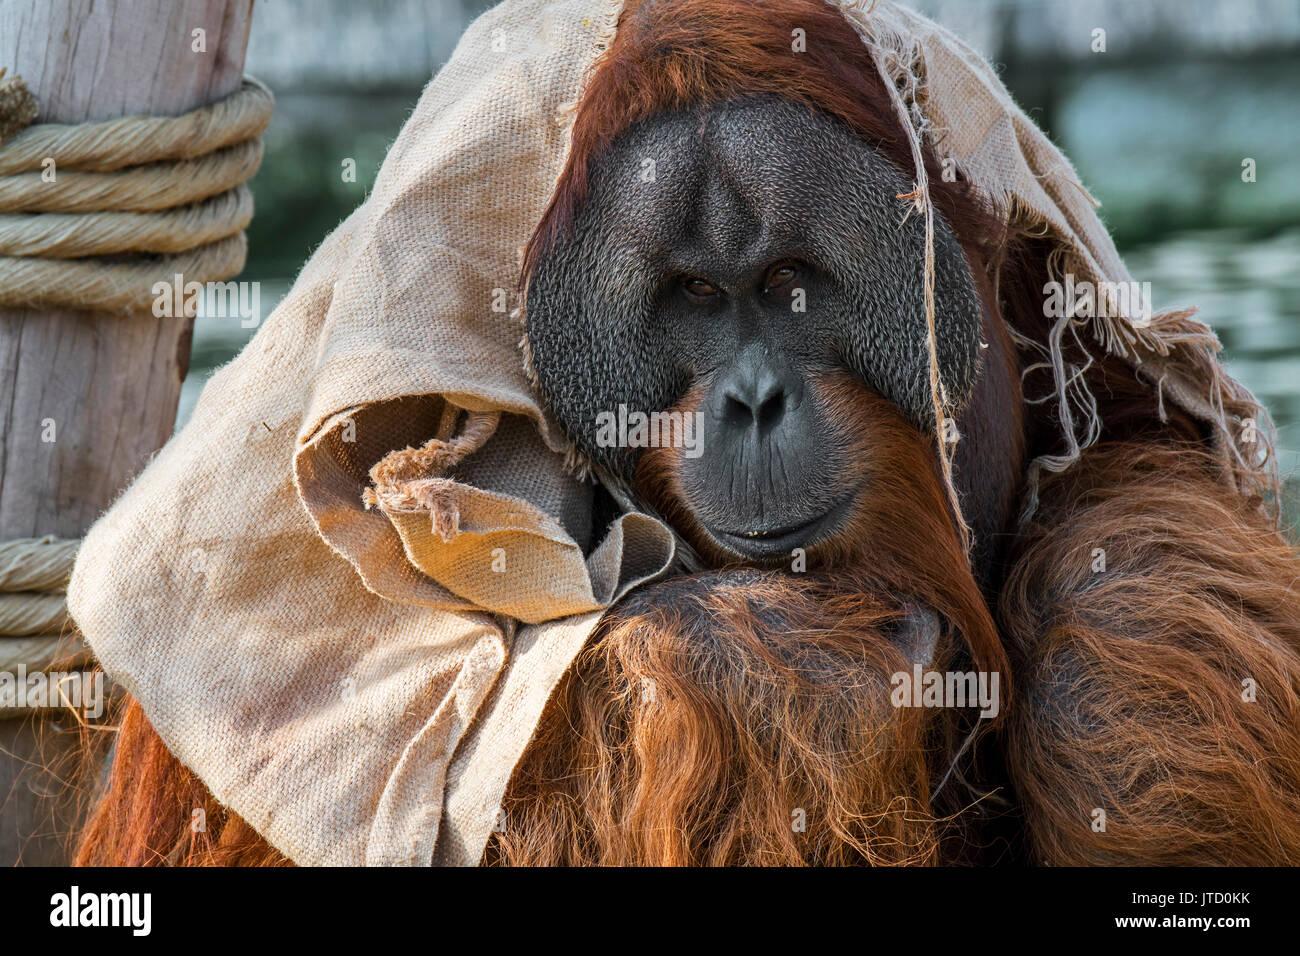 sumatran-orangutan-orang-utang-pongo-abelii-male-wrapped-in-cloth-JTD0KK.jpg